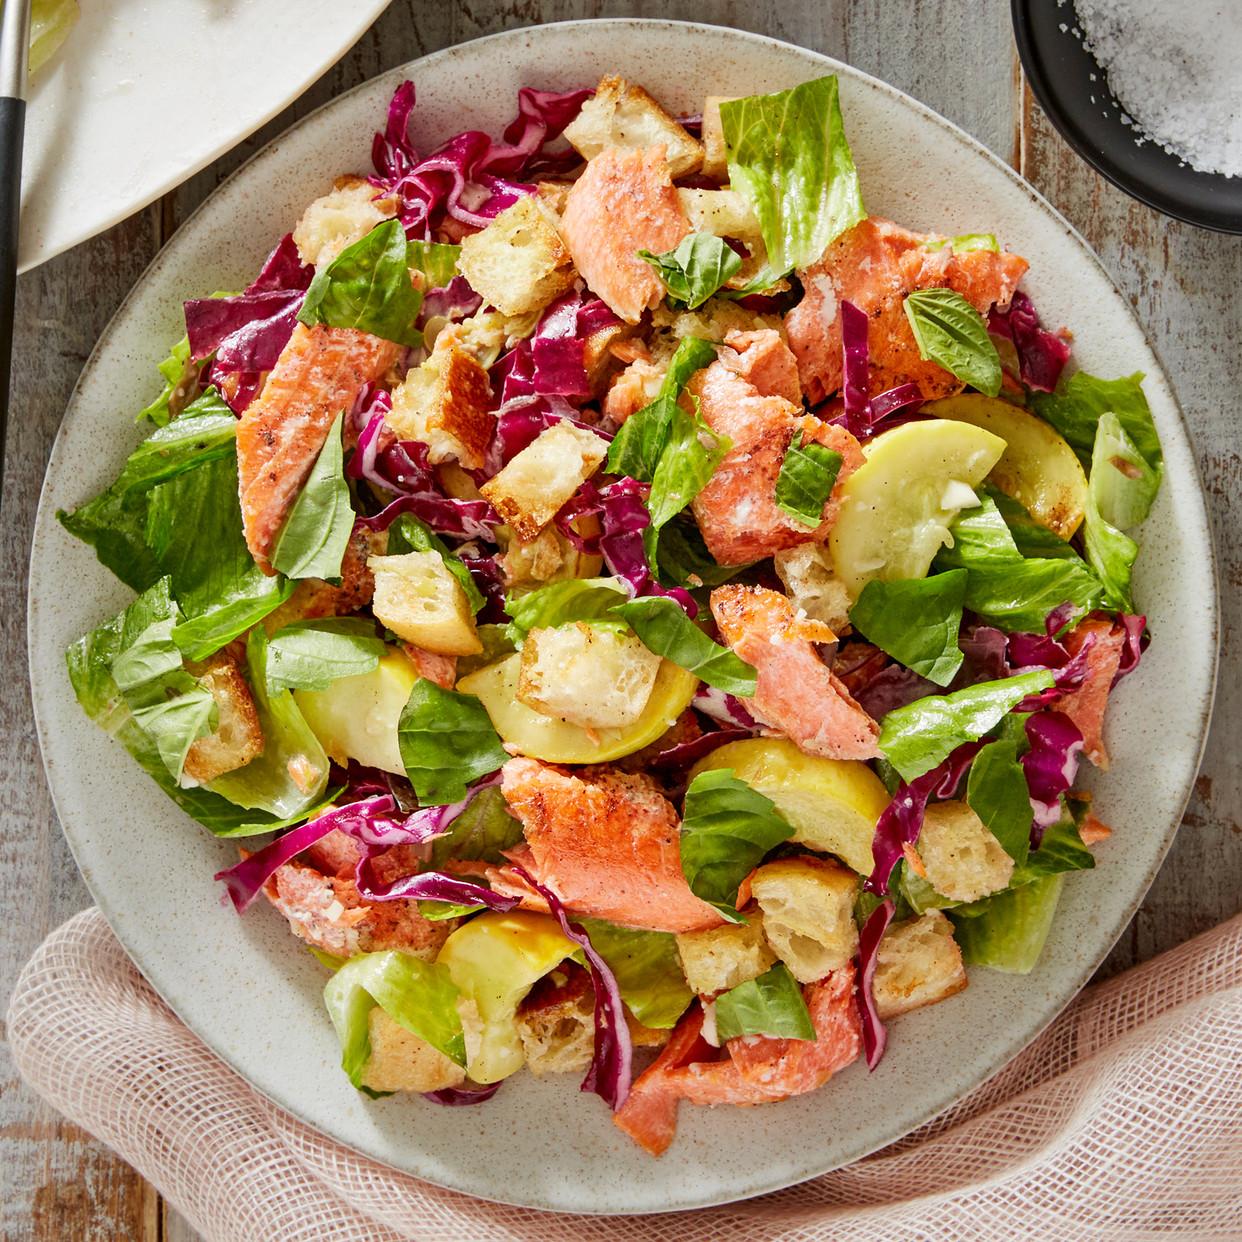 Summer Salmon Salad  Recipe Salmon Caesar Salad with Parmesan Croutons